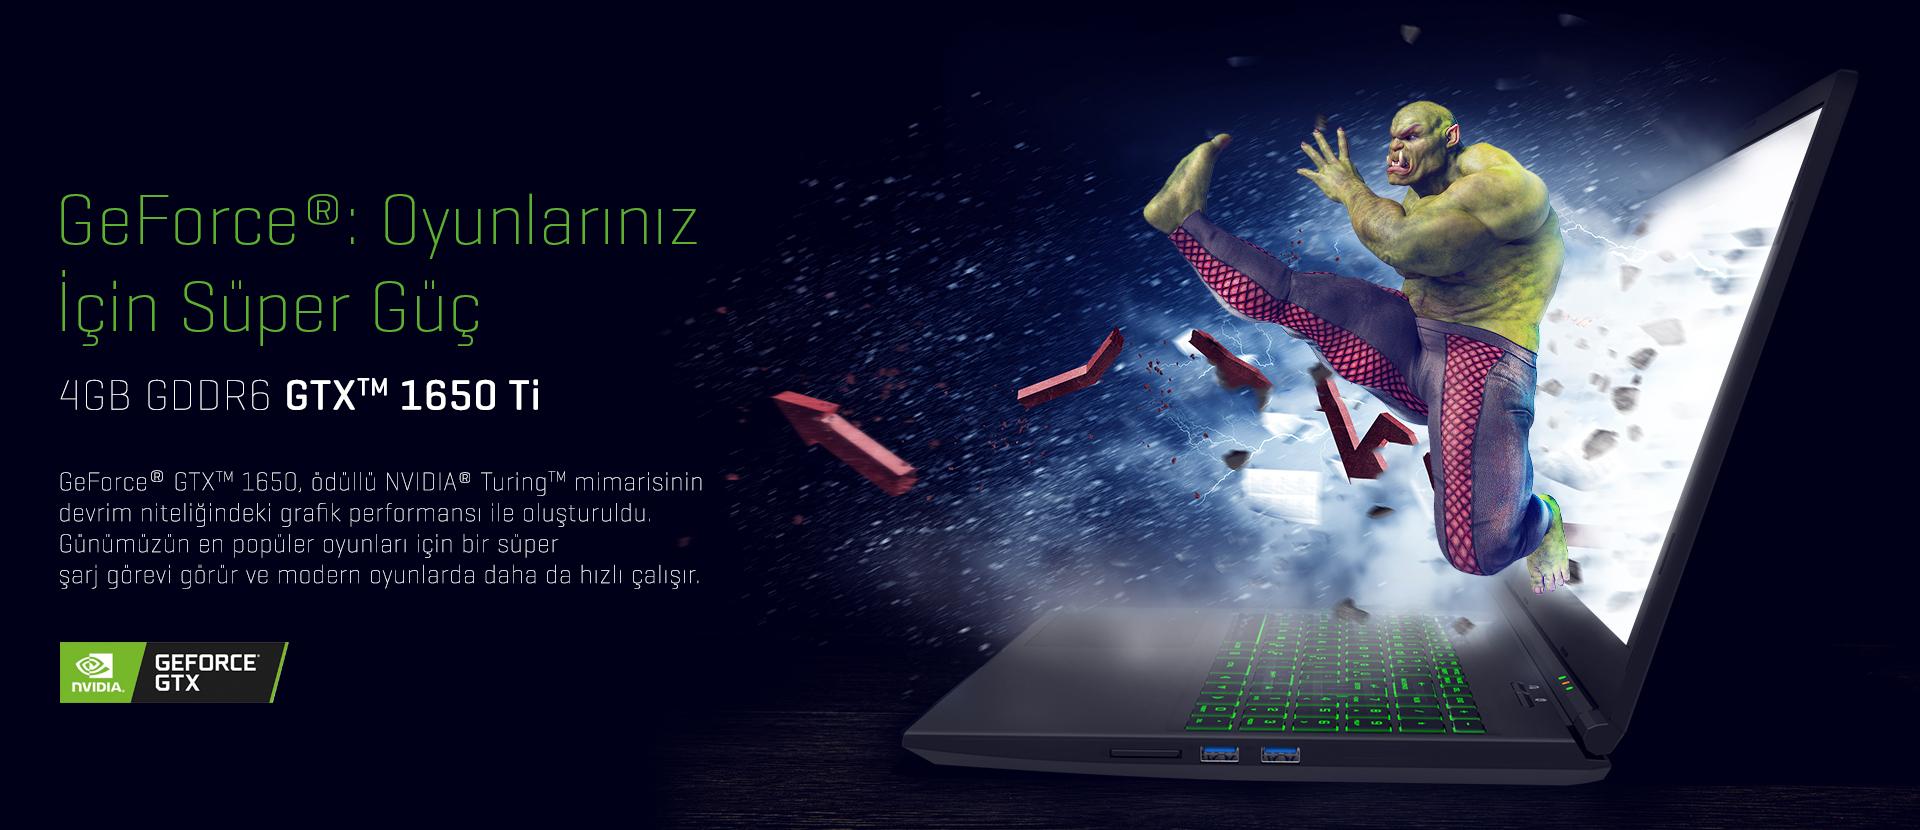 Monster Notebook Abra A5 V15.7